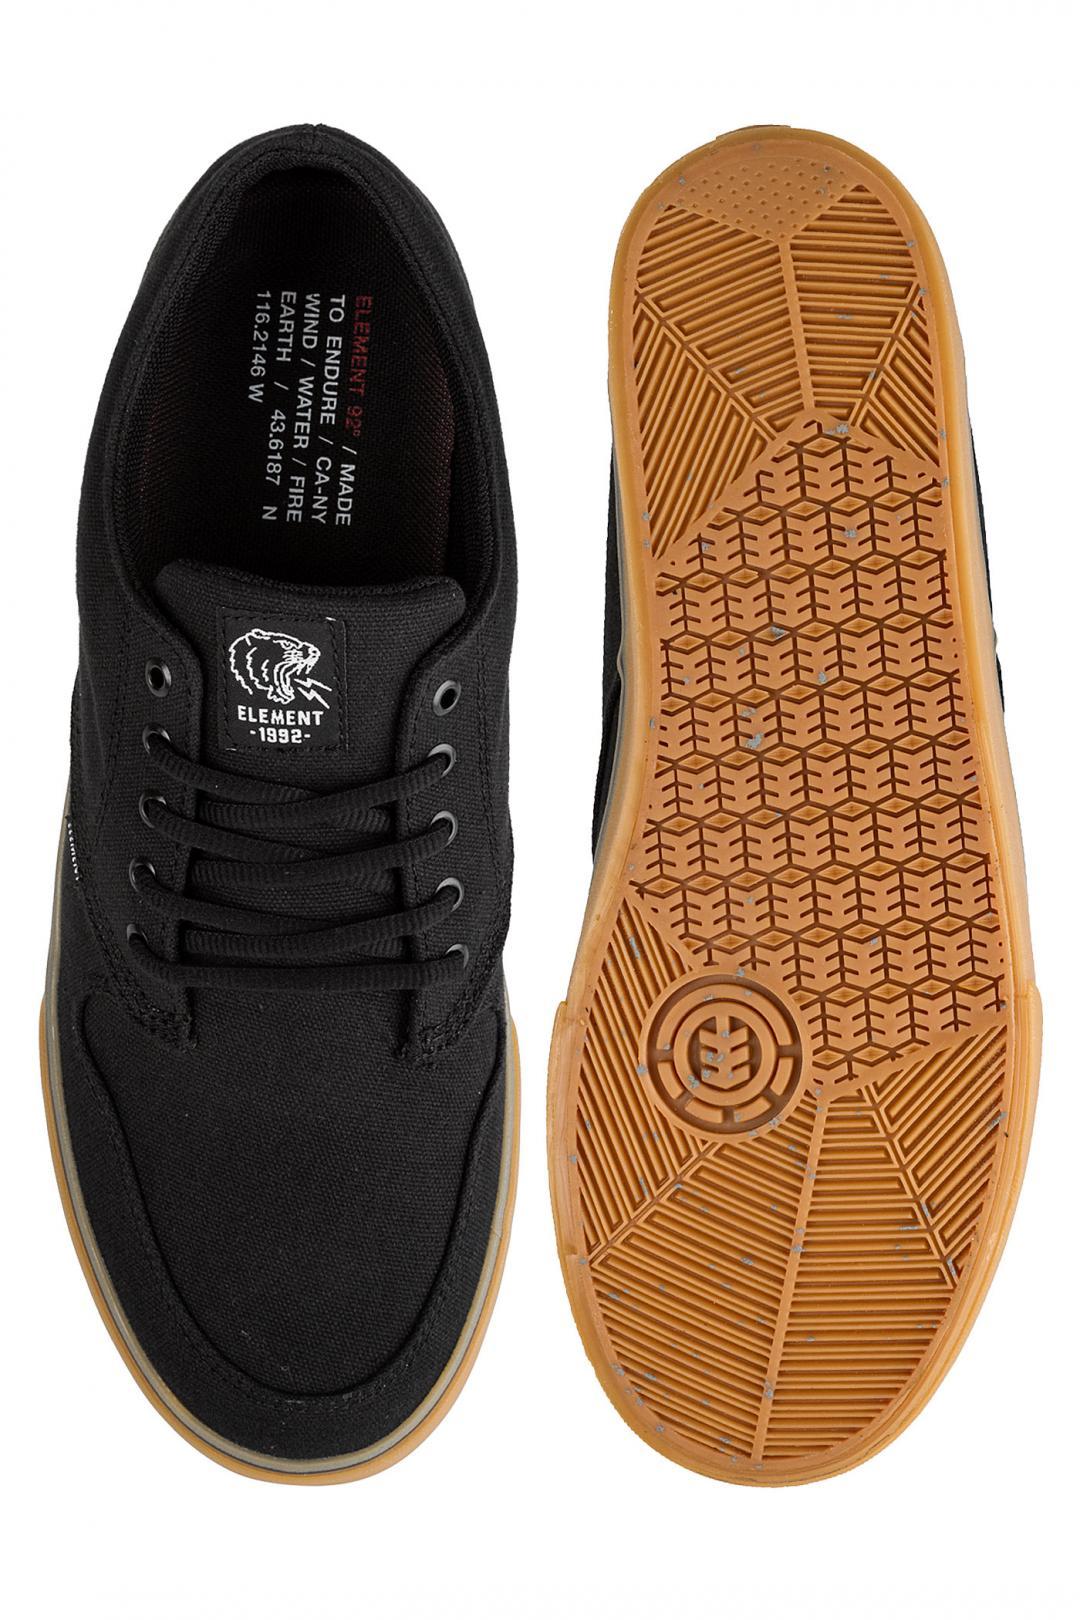 Uomo Element Topaz C3 black gum | Sneakers low top